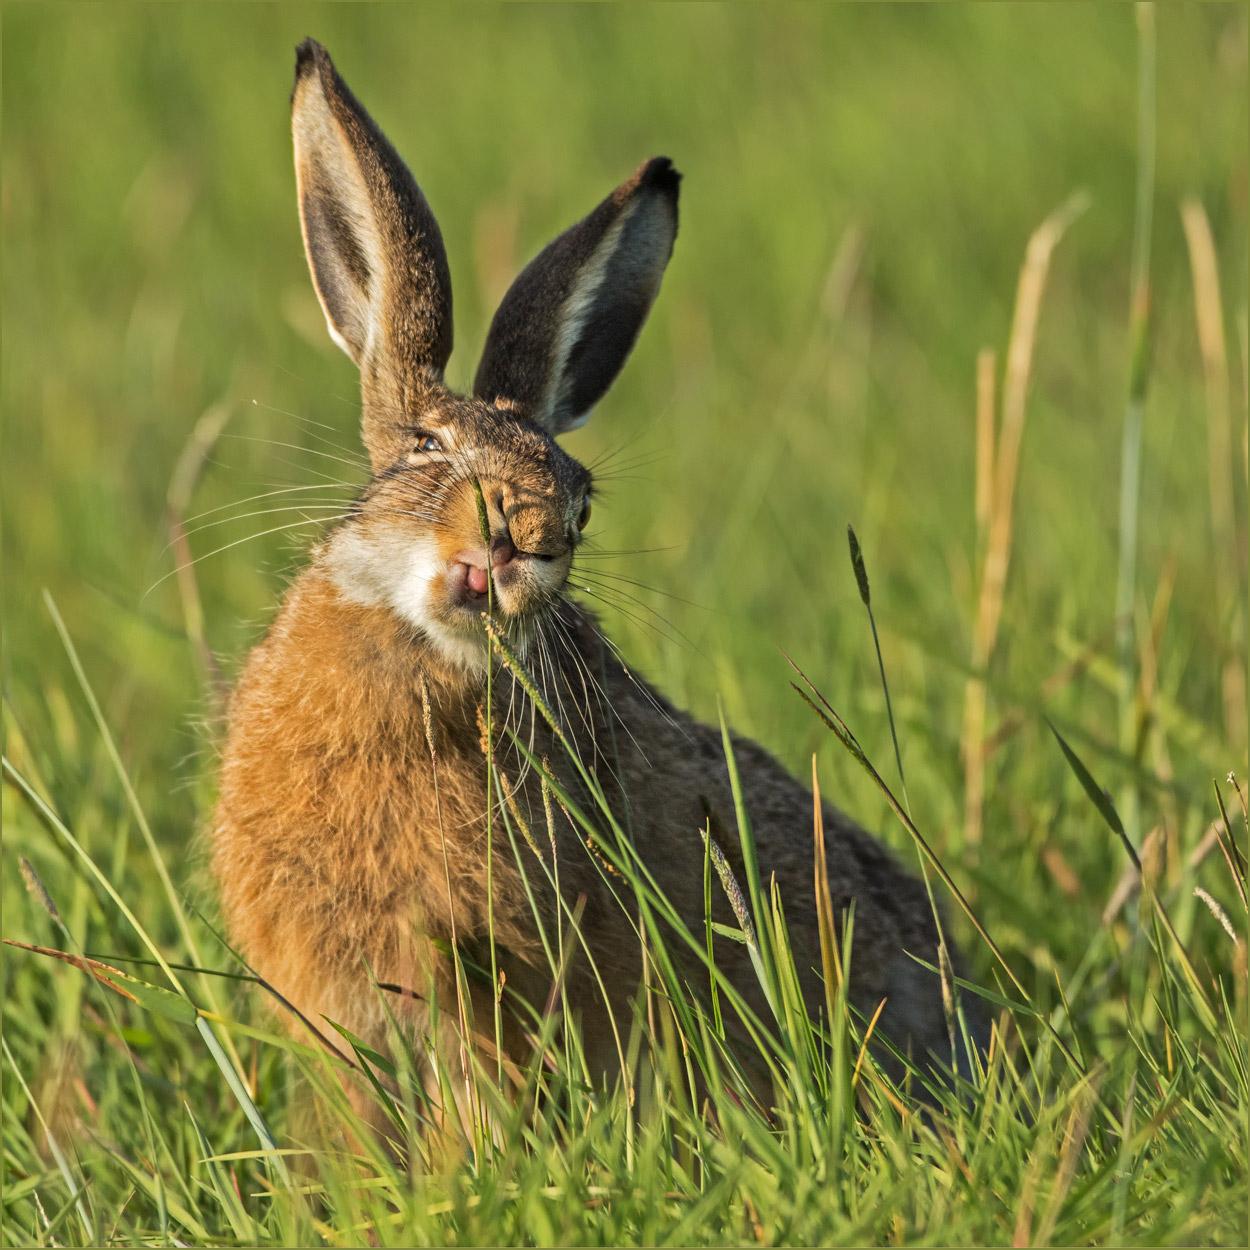 SW093 Feldhase / hare